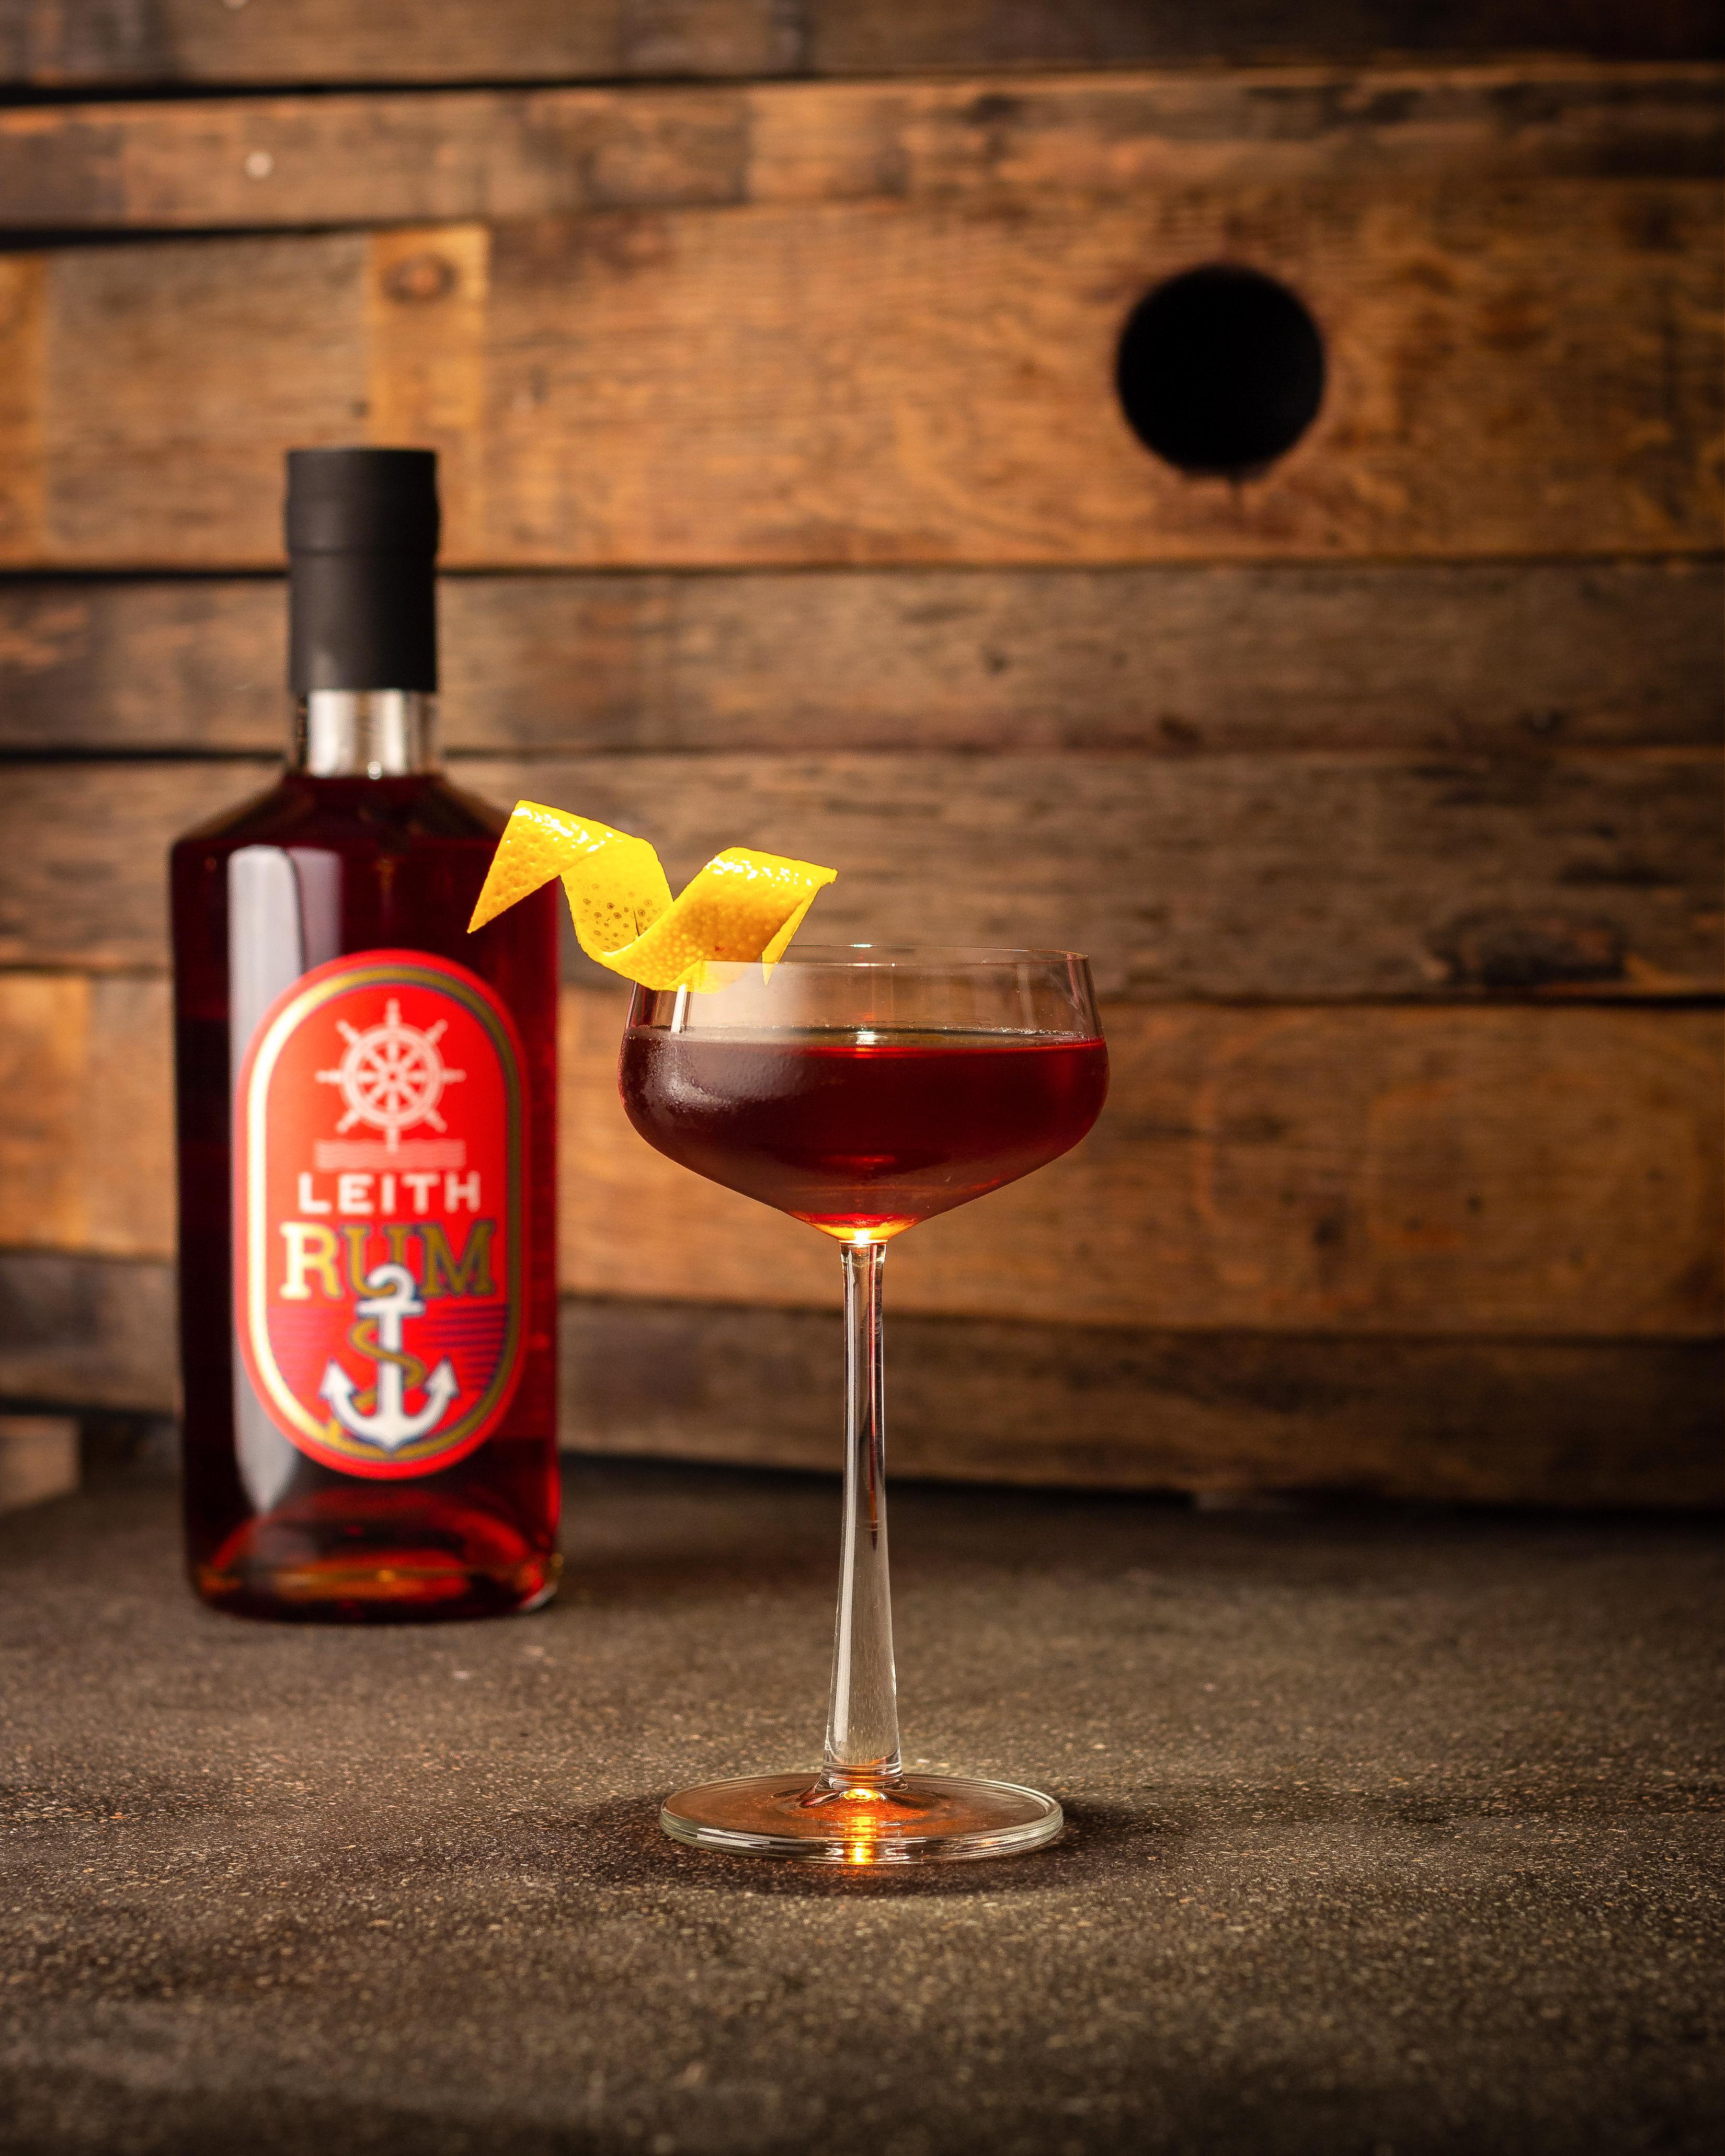 Leith Rum